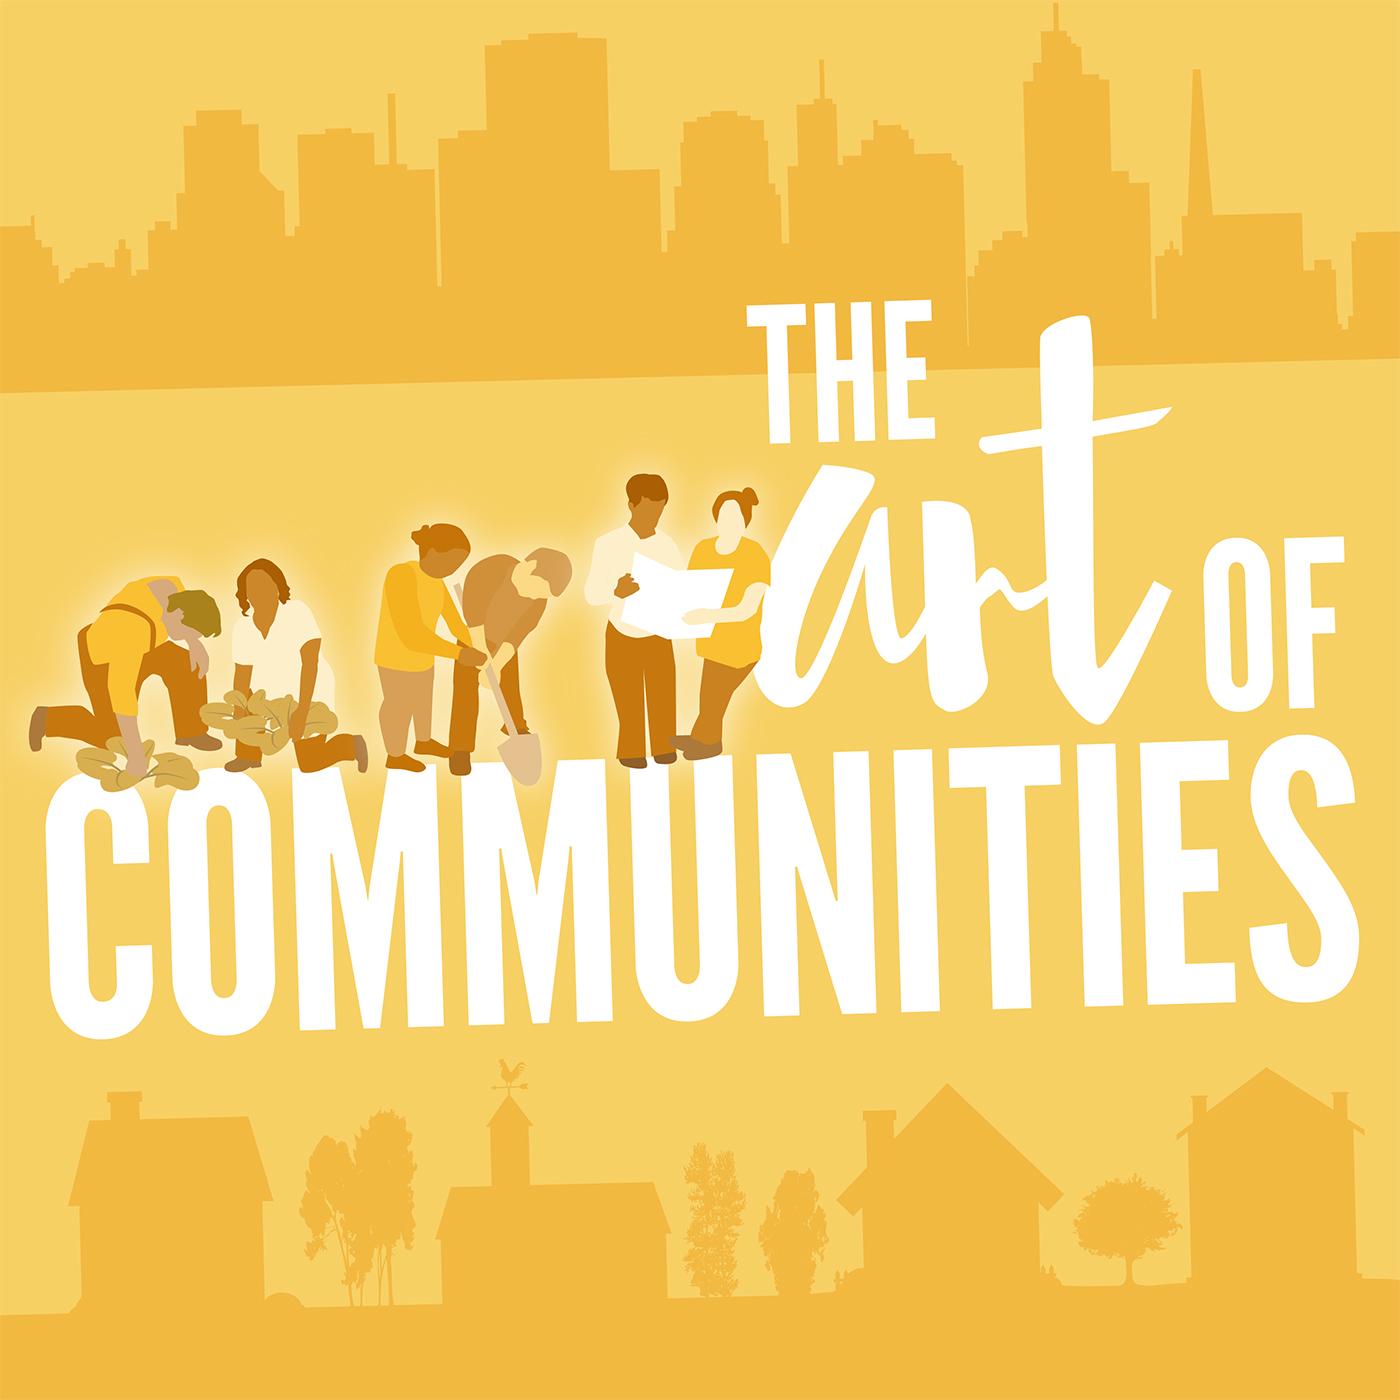 TheArtofCommunities_1400.jpg